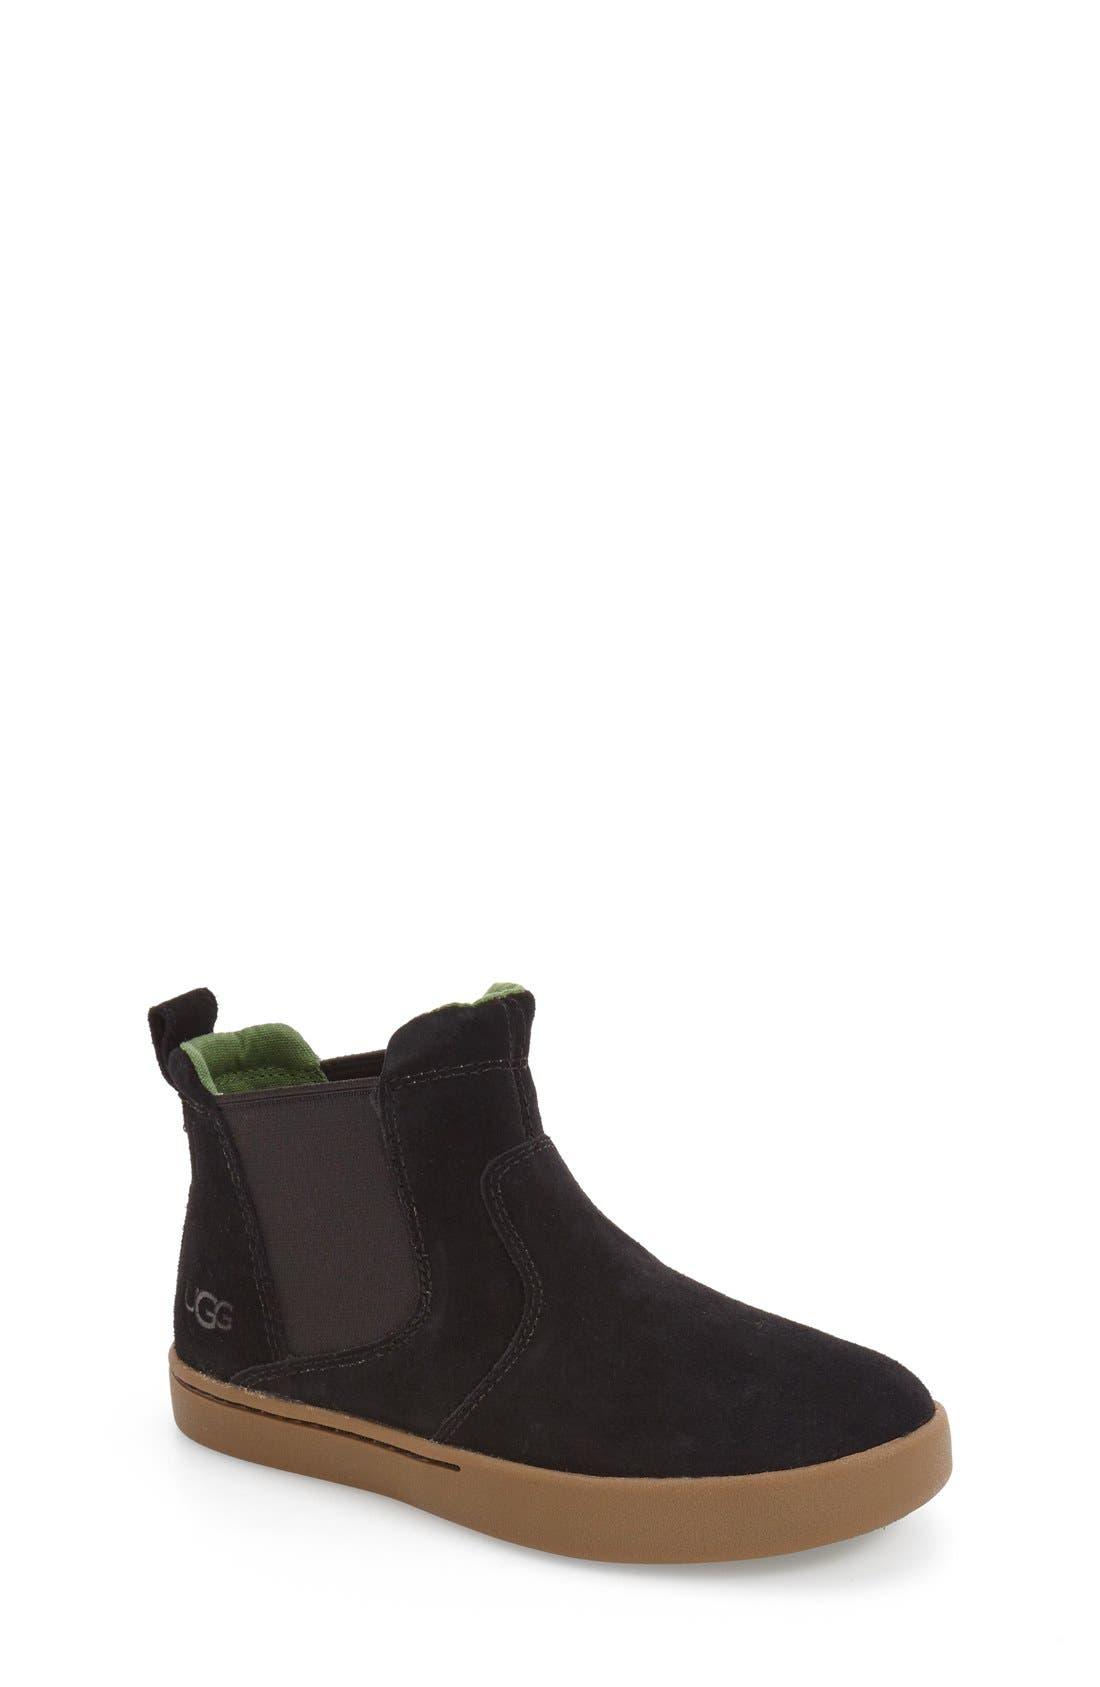 Hamden Sneaker,                             Main thumbnail 1, color,                             001